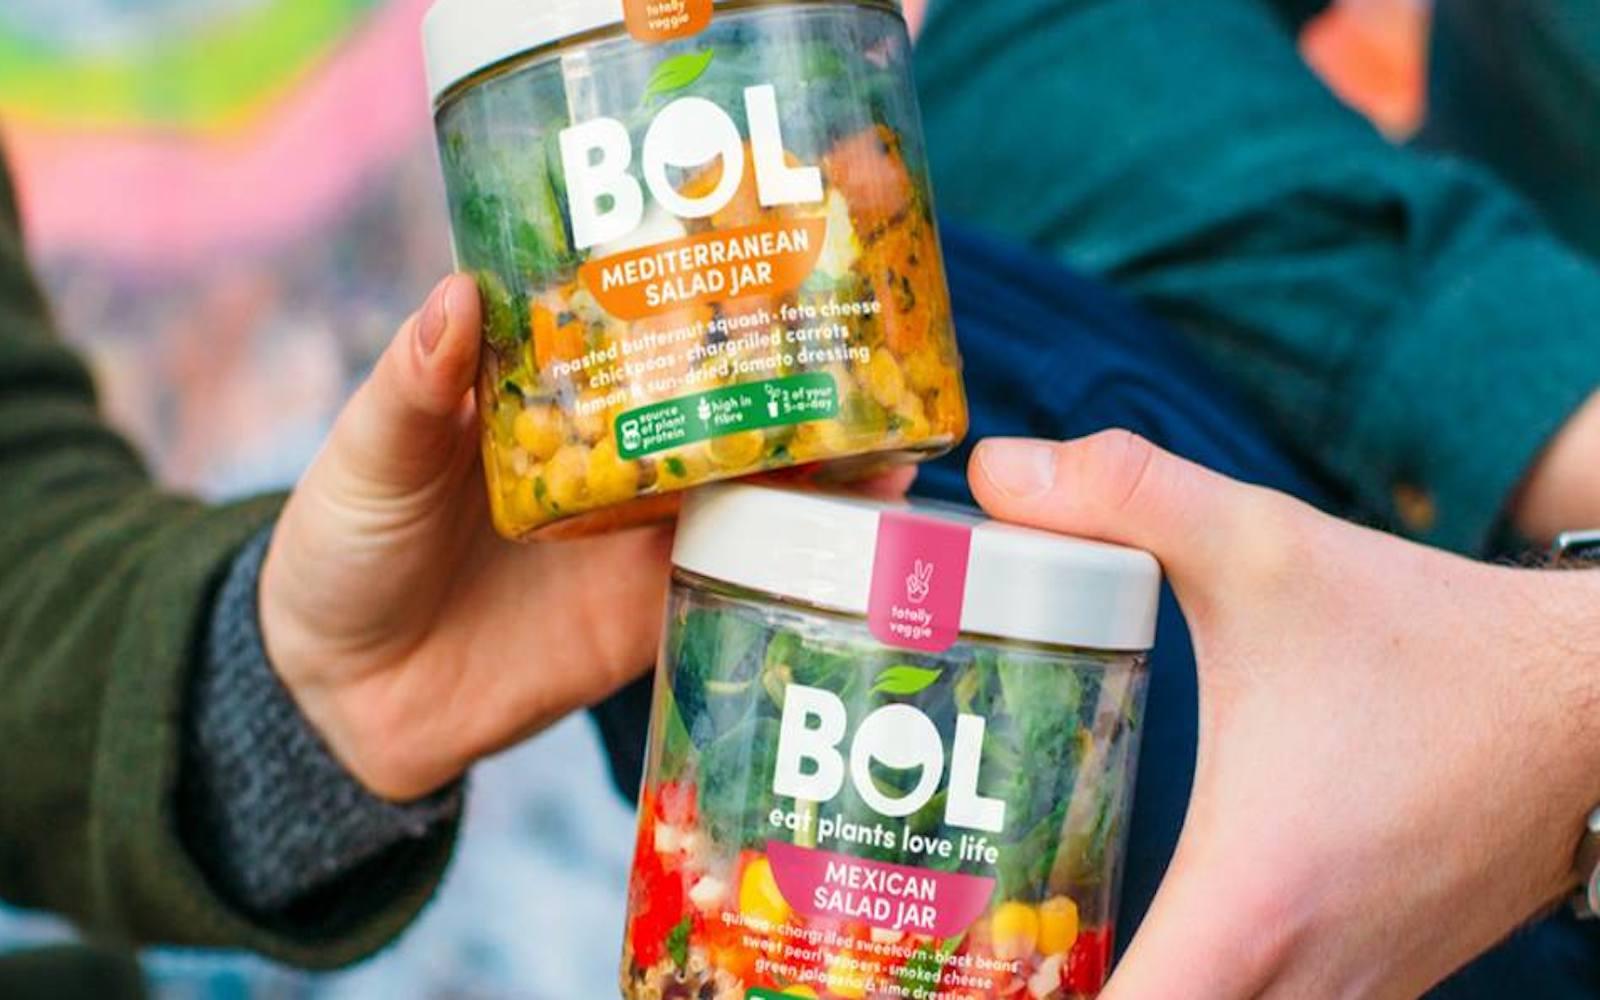 bol-vegan-salad-jars